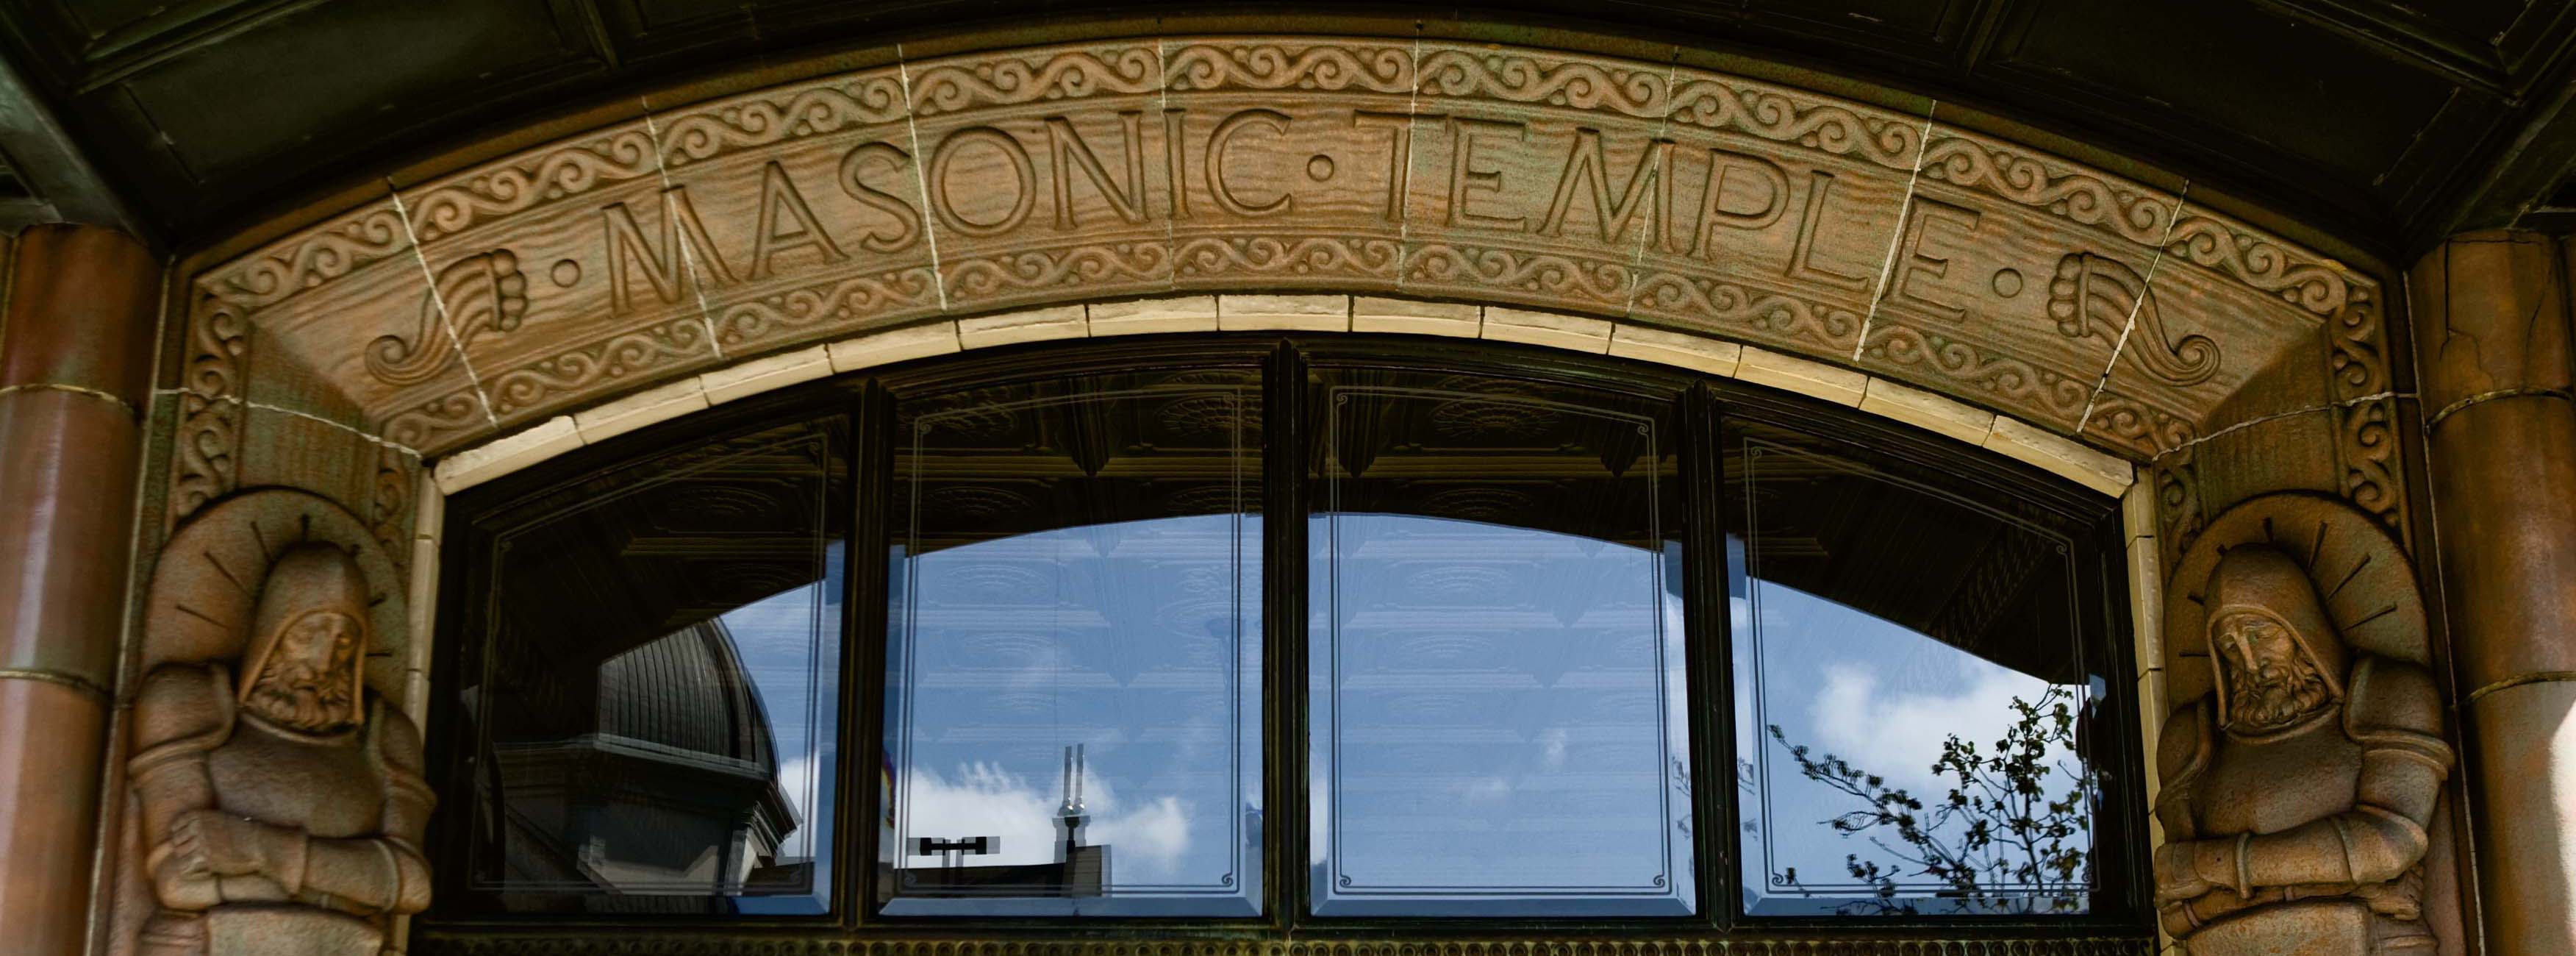 Sacramento Masonic Temple | Home